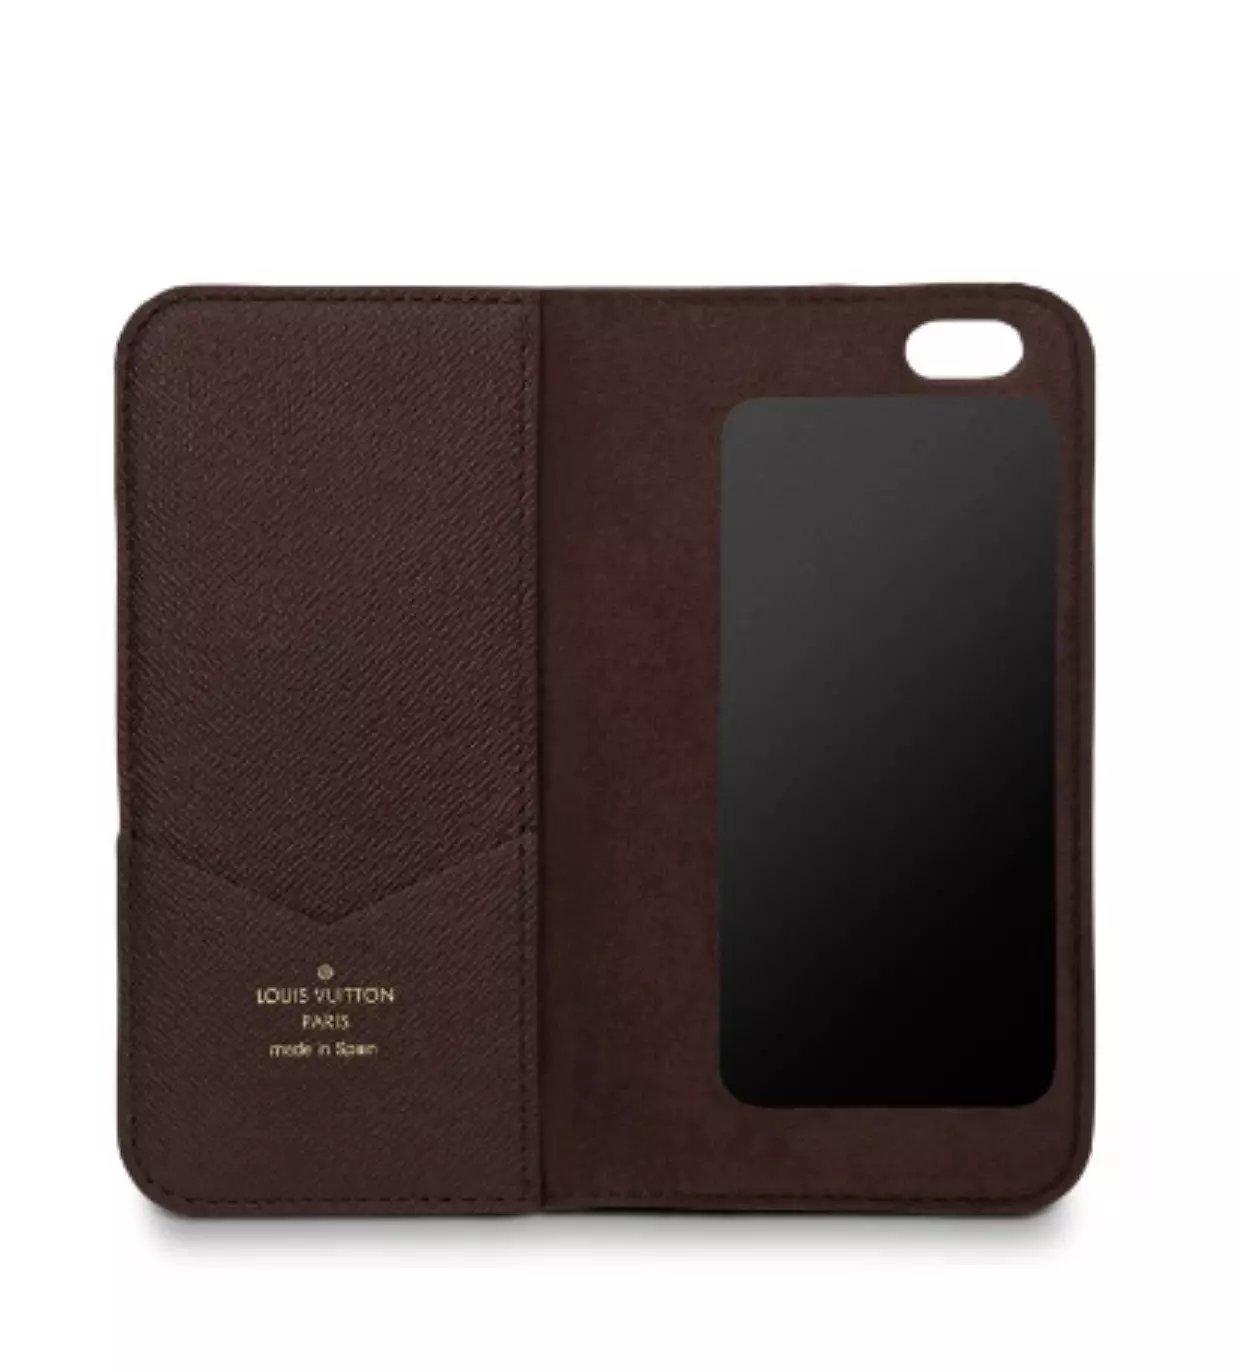 iphone hülle drucken iphone hülle designen Louis Vuitton iphone6 hülle apple handyhülle tasche für iphone handyhüllen für iphone 6 eigene handyhülle iphone 6 vorbestellen iphone neues display